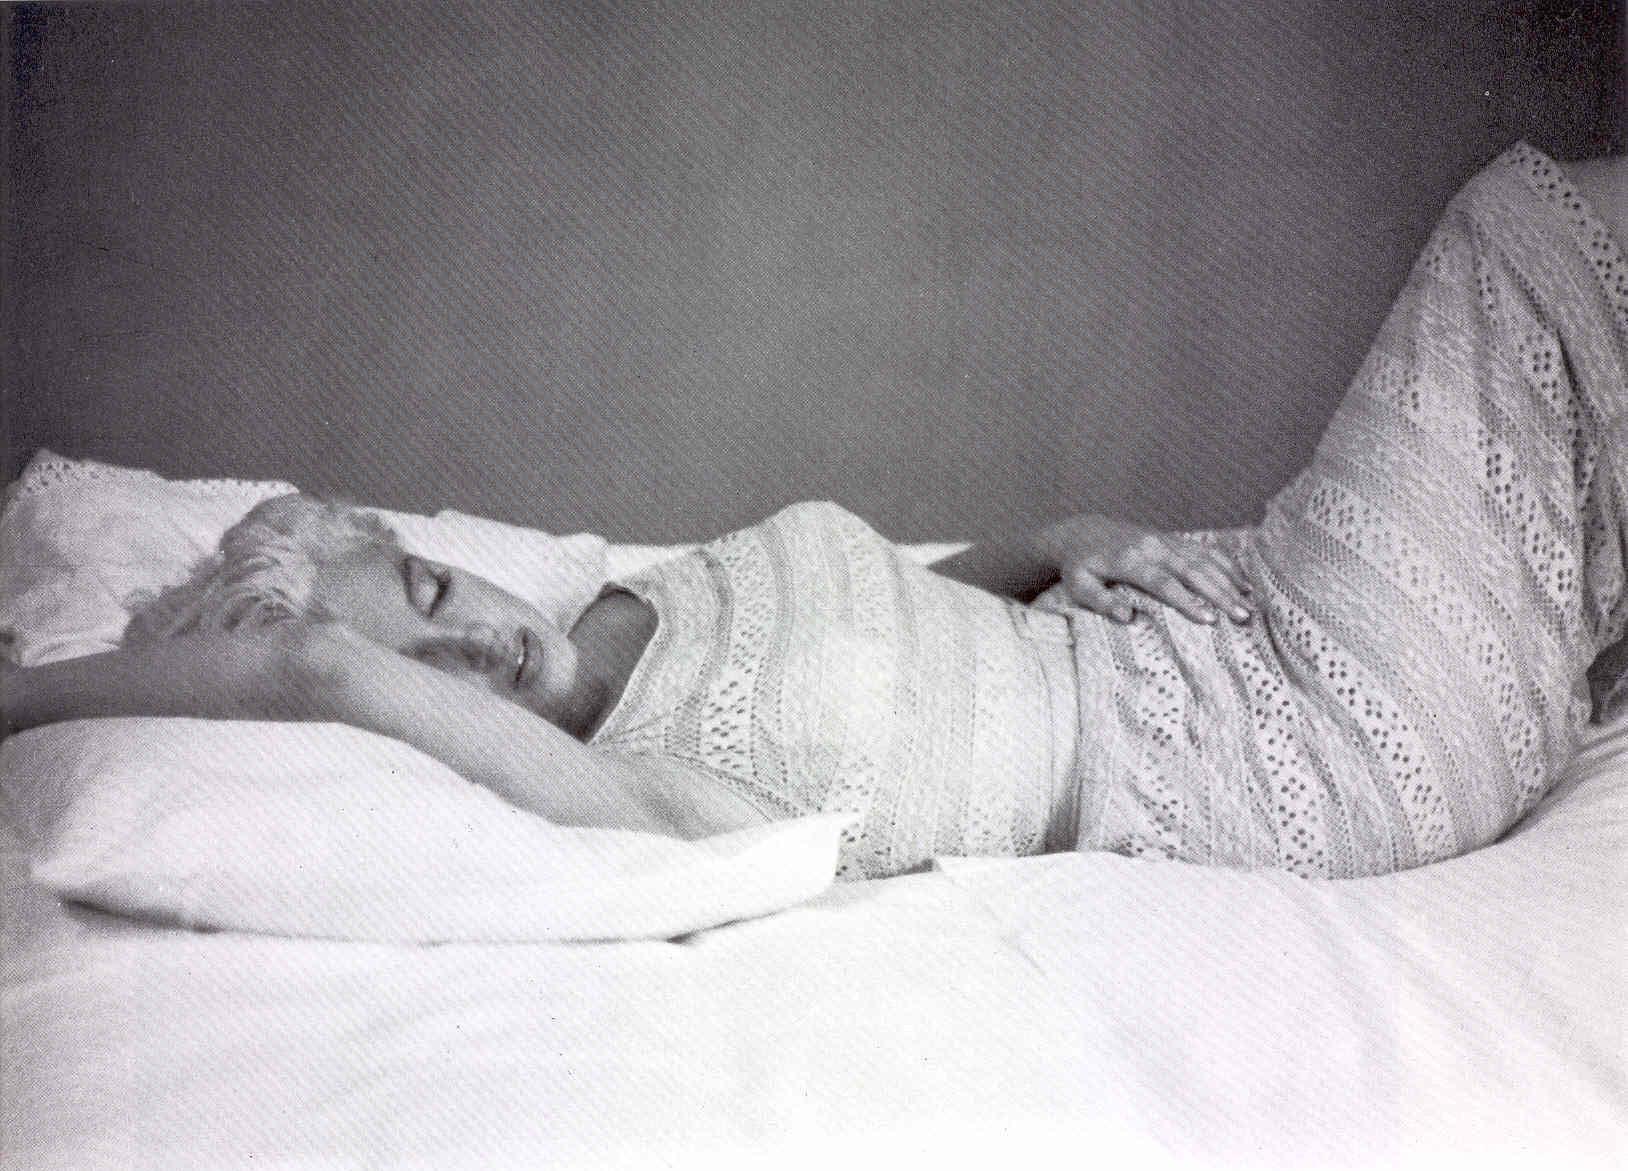 Marilyn Monroe Eve Arnold pause 1